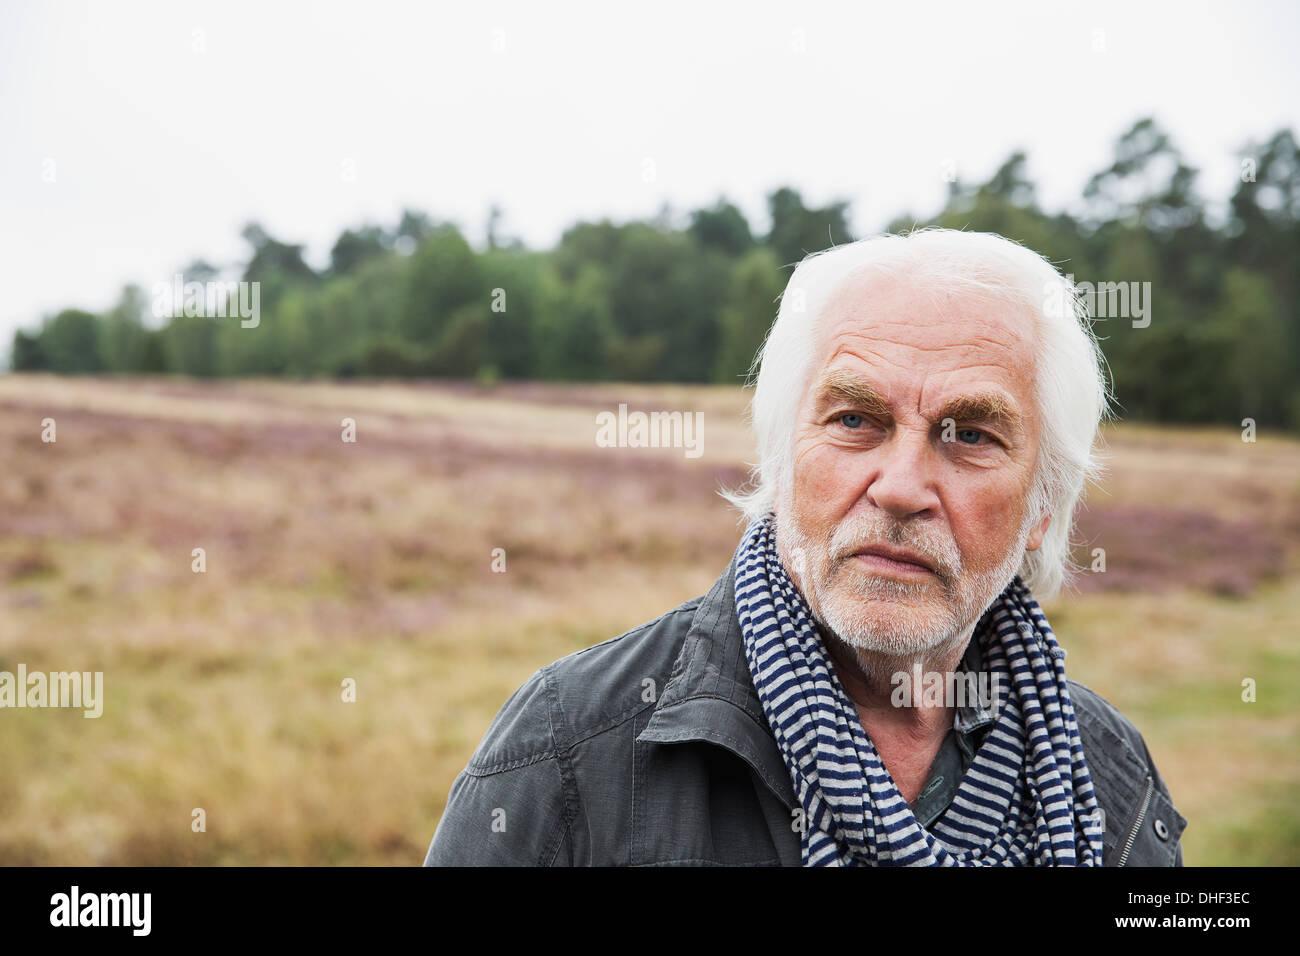 Portrait of senior man with cheveux gris Photo Stock